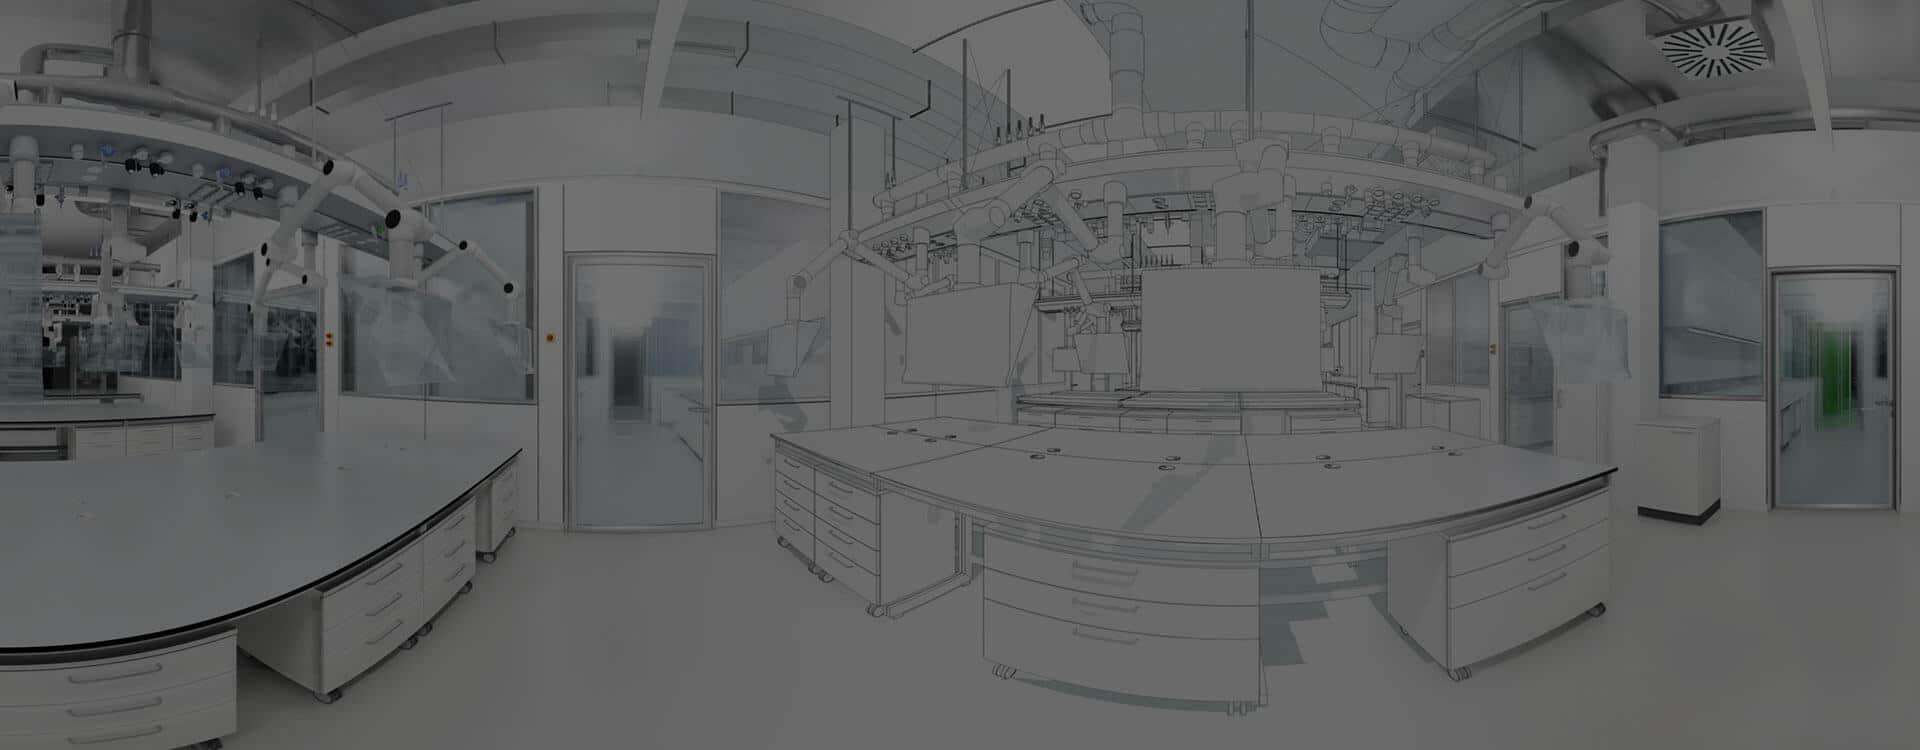 Longo Labs Lab Planning and Design